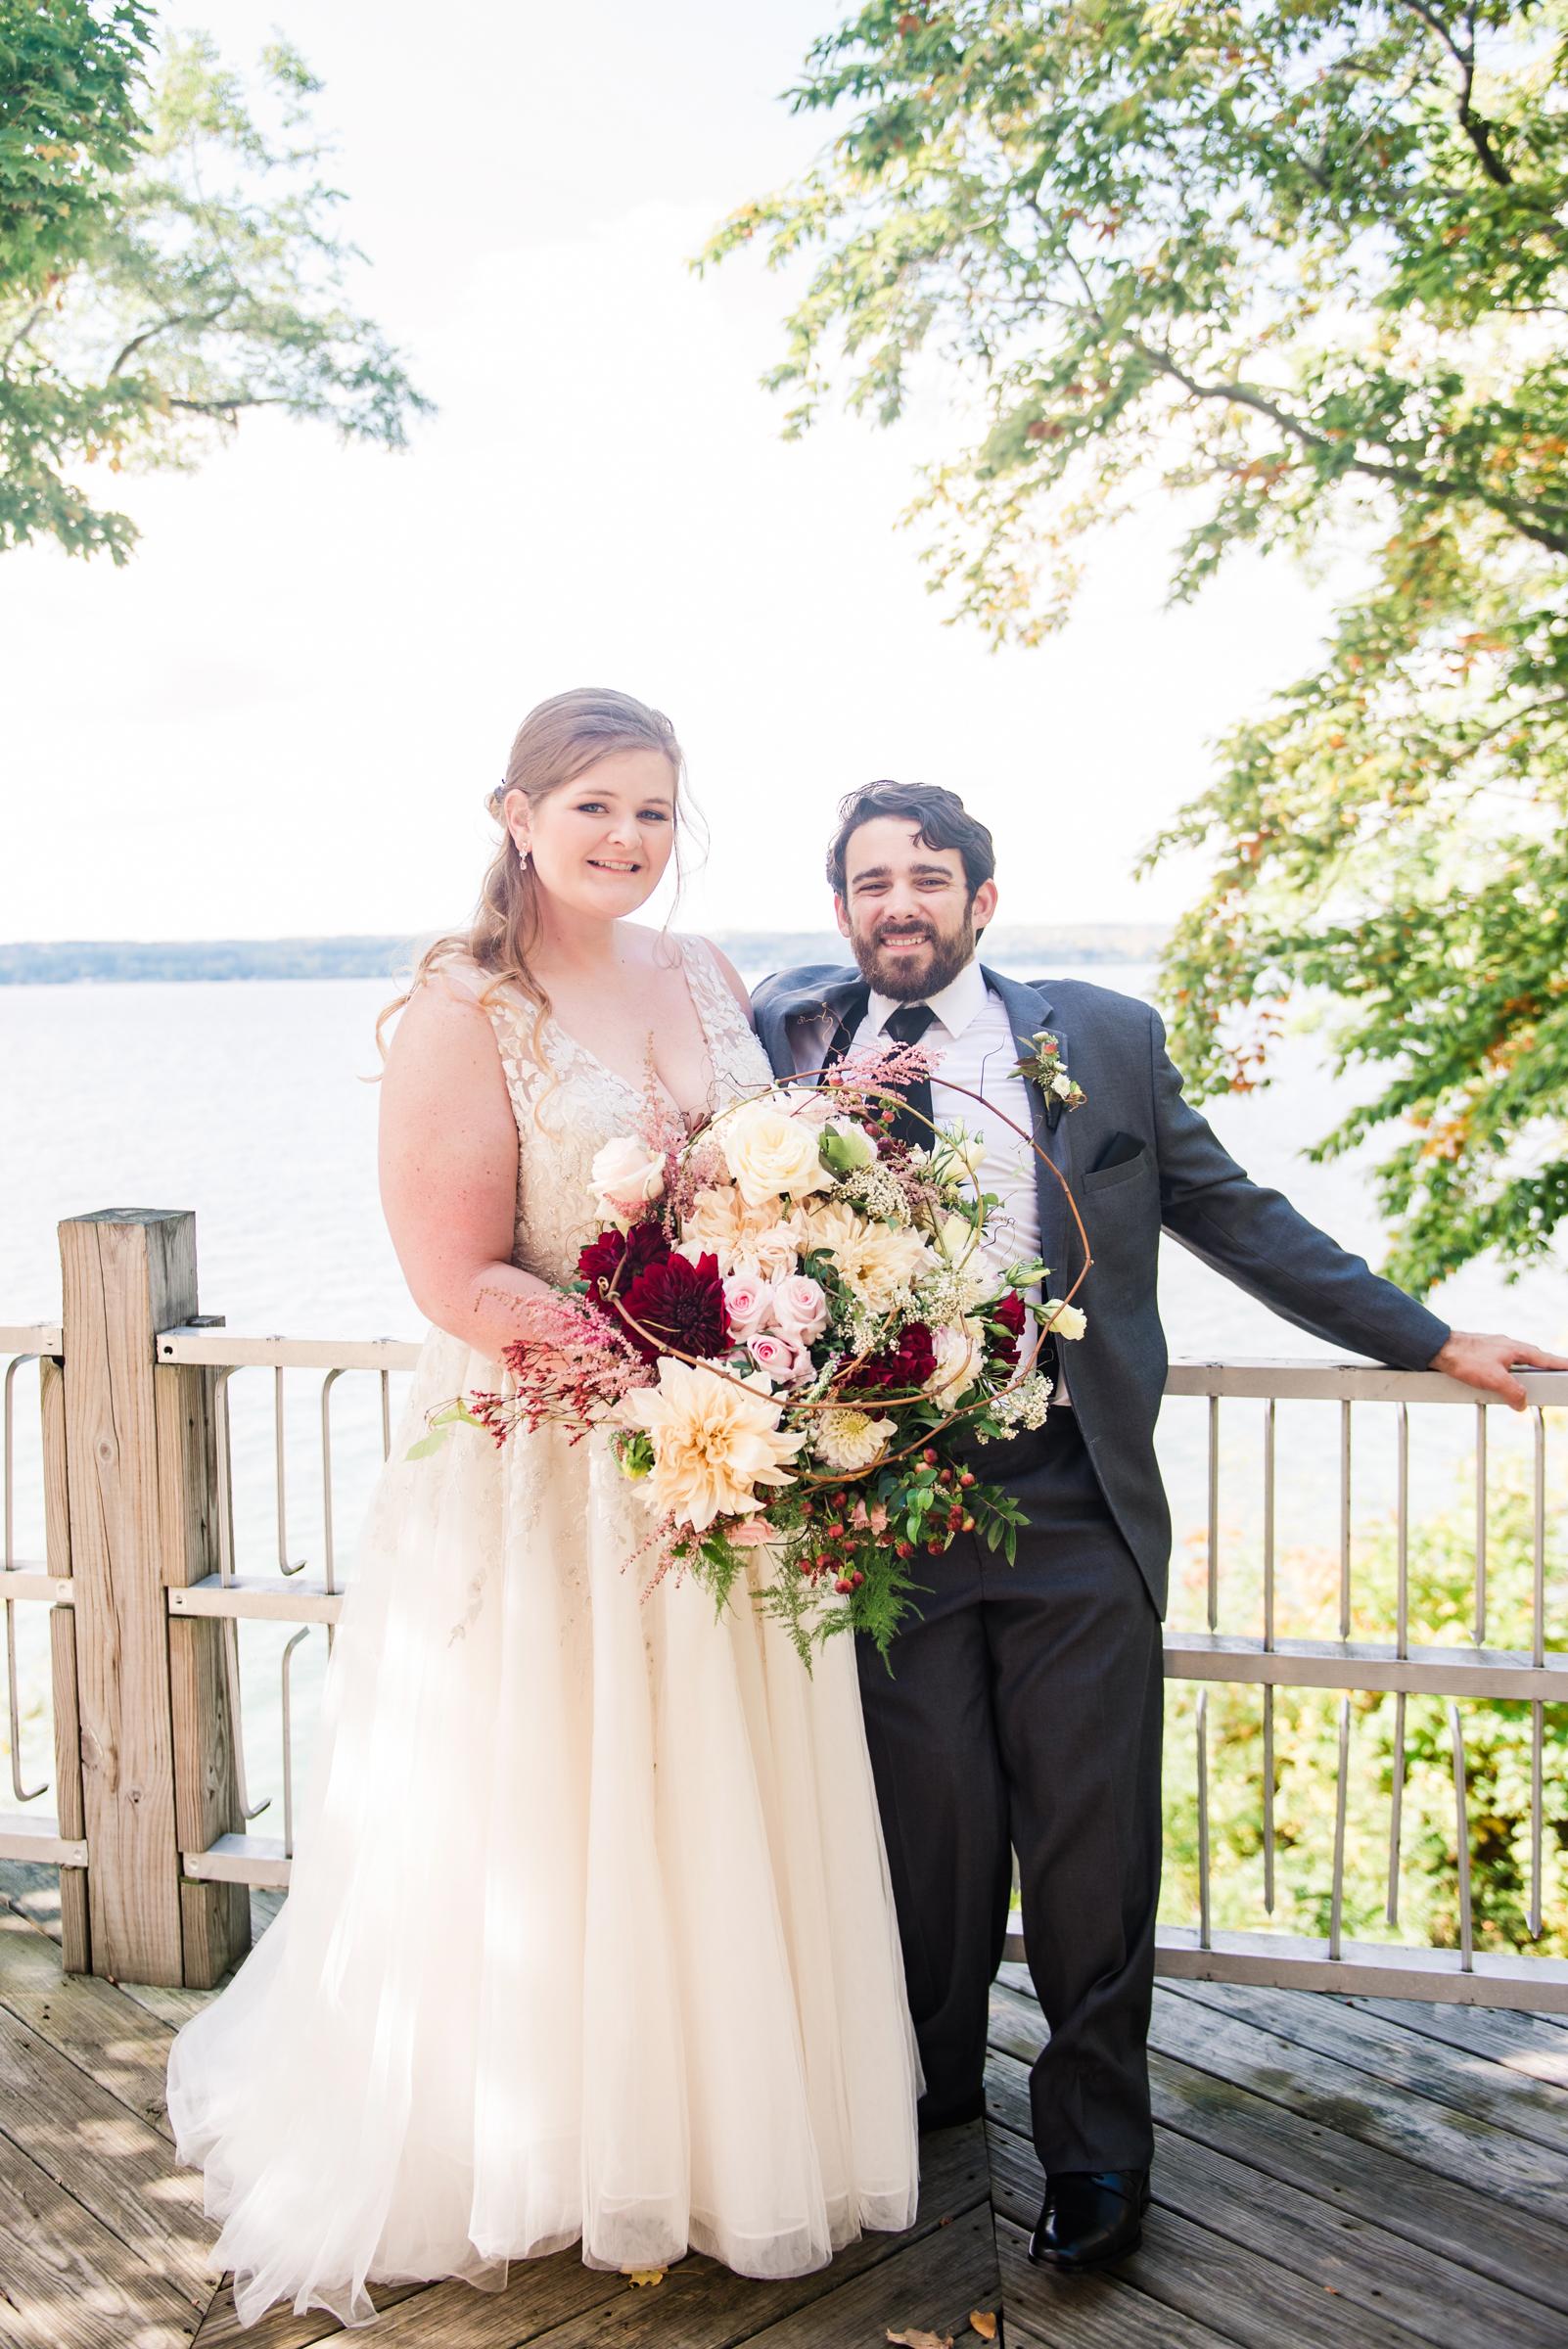 Zugibe_Vineyards_Finger_Lakes_Wedding_JILL_STUDIO_Rochester_NY_Photographer_DSC_3480.jpg